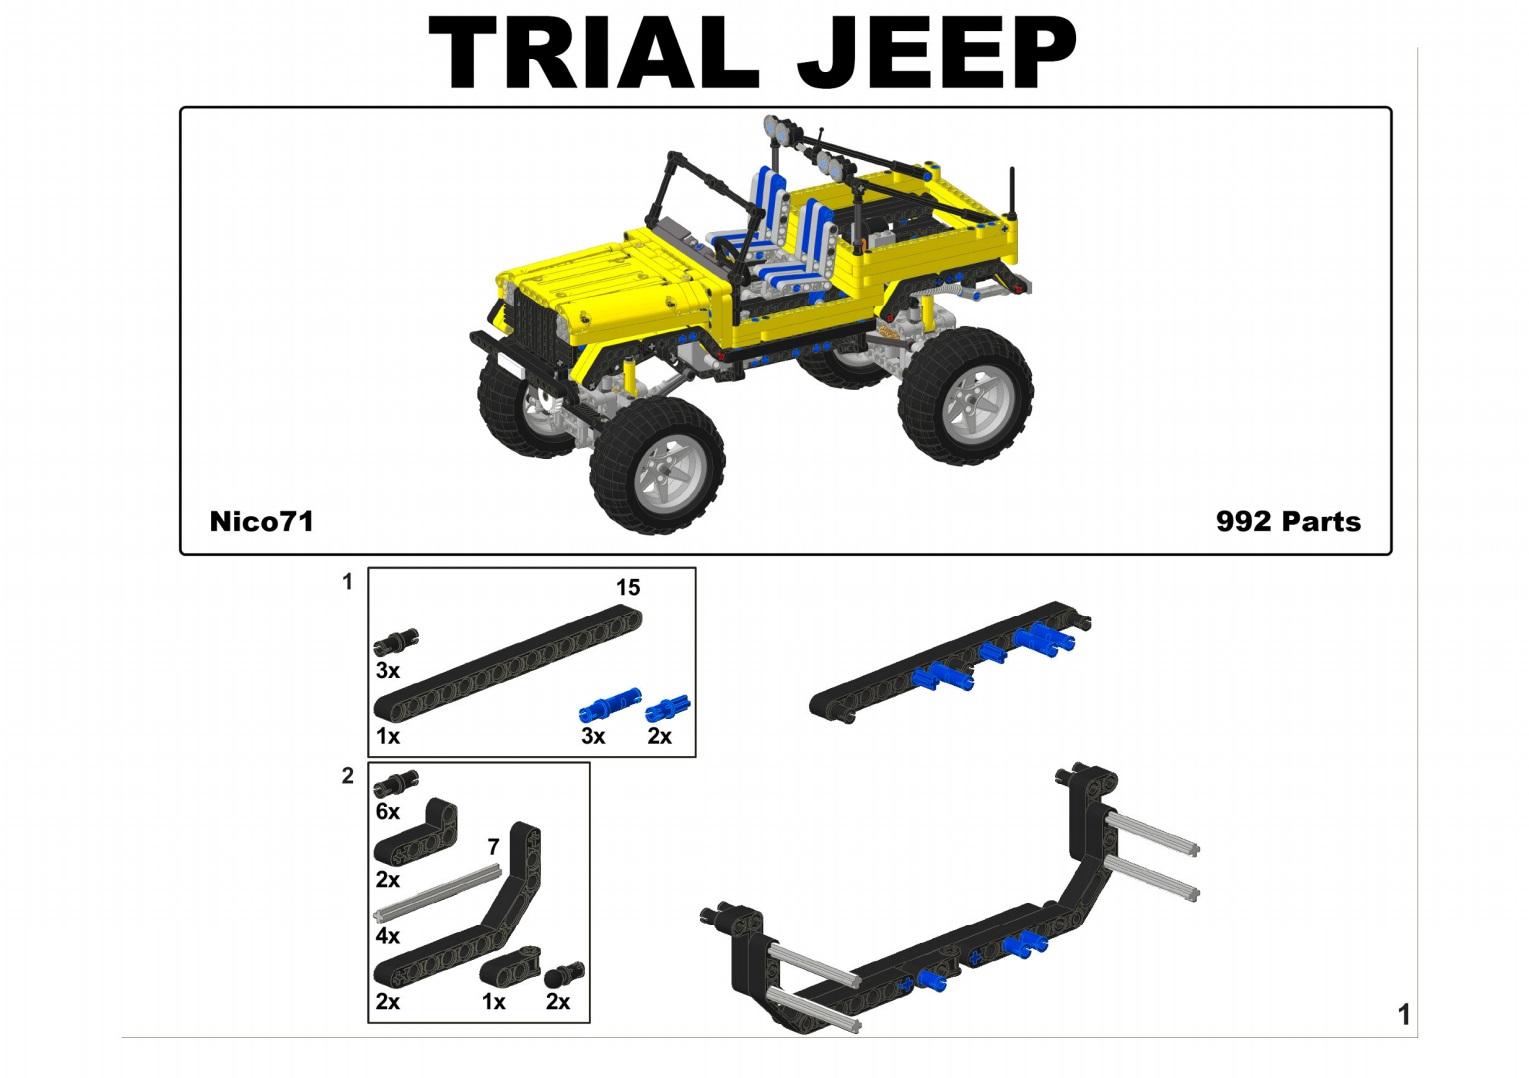 Trial Jeep Nico71s Creations